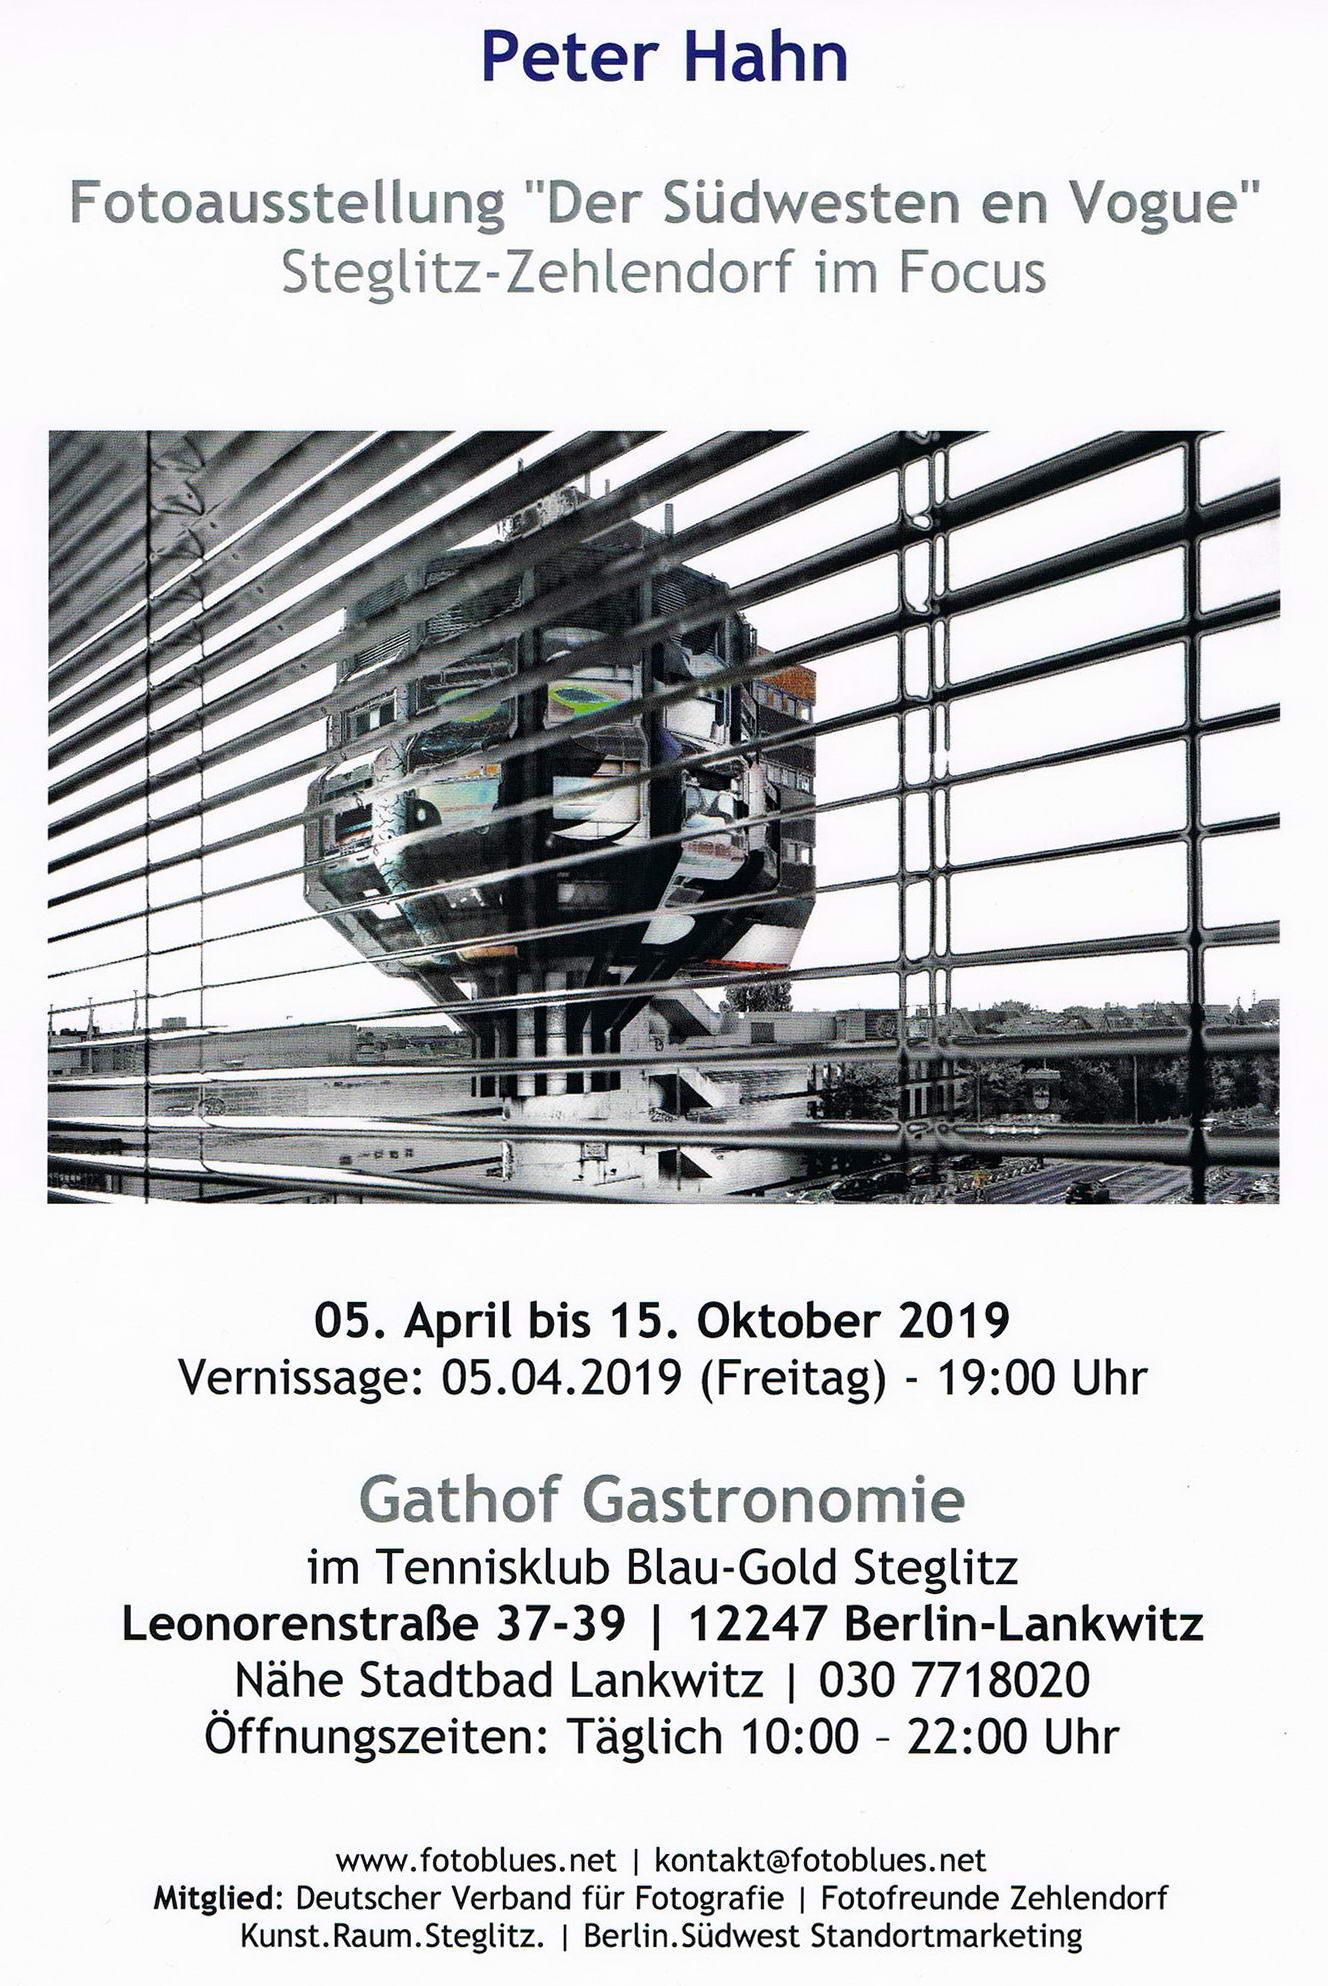 fotoblues Foto Ausstellung Gathof Gastronomie 05.04. 15.10.2019 Peter Hahn konv1a